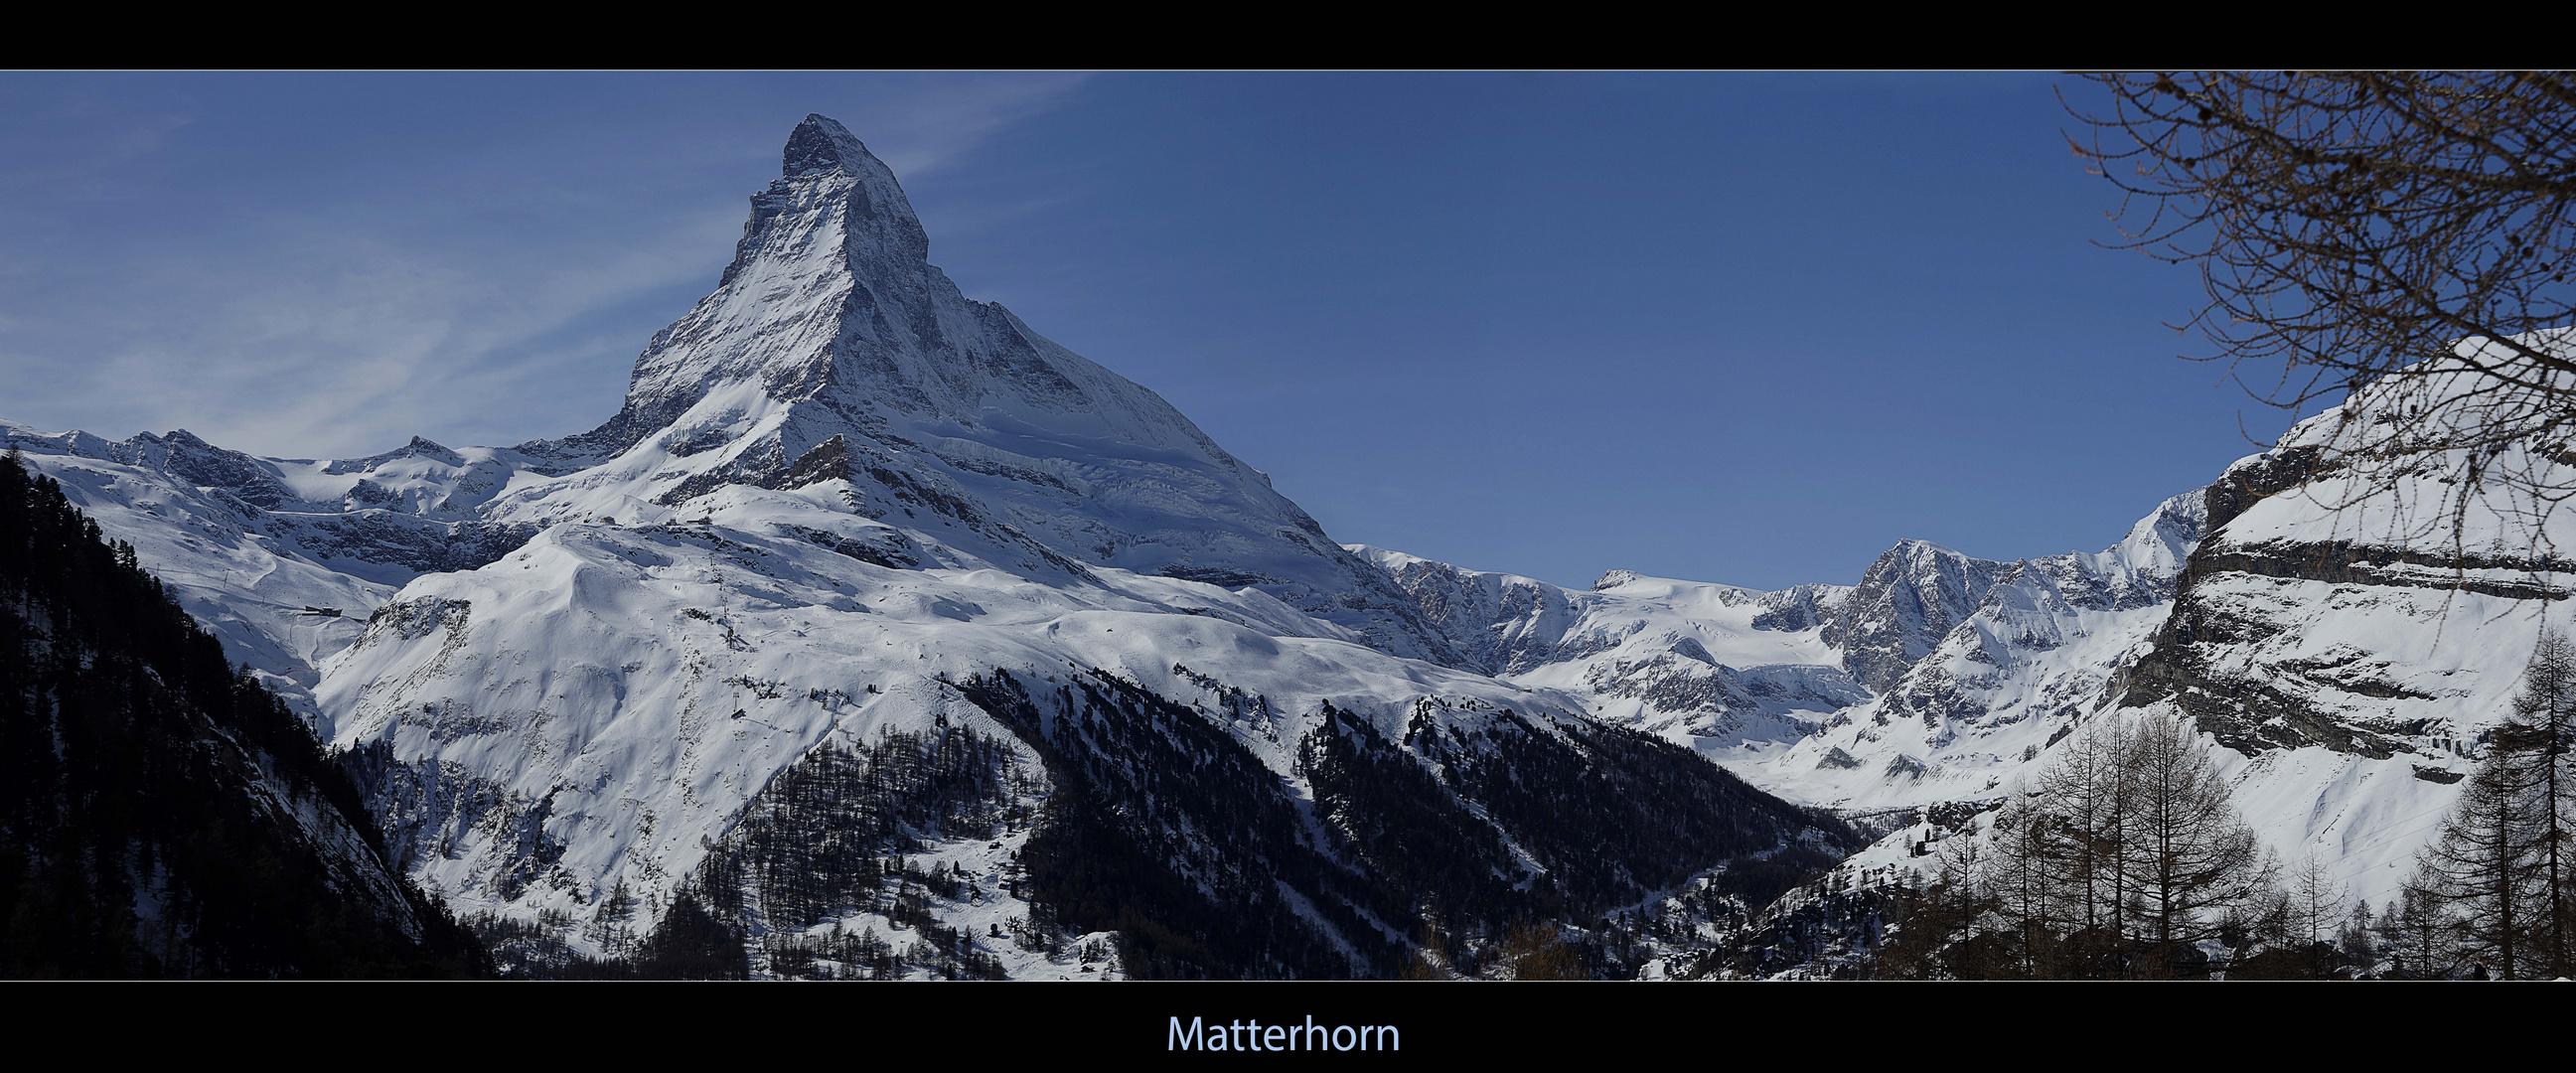 Matterhorn - Panorama